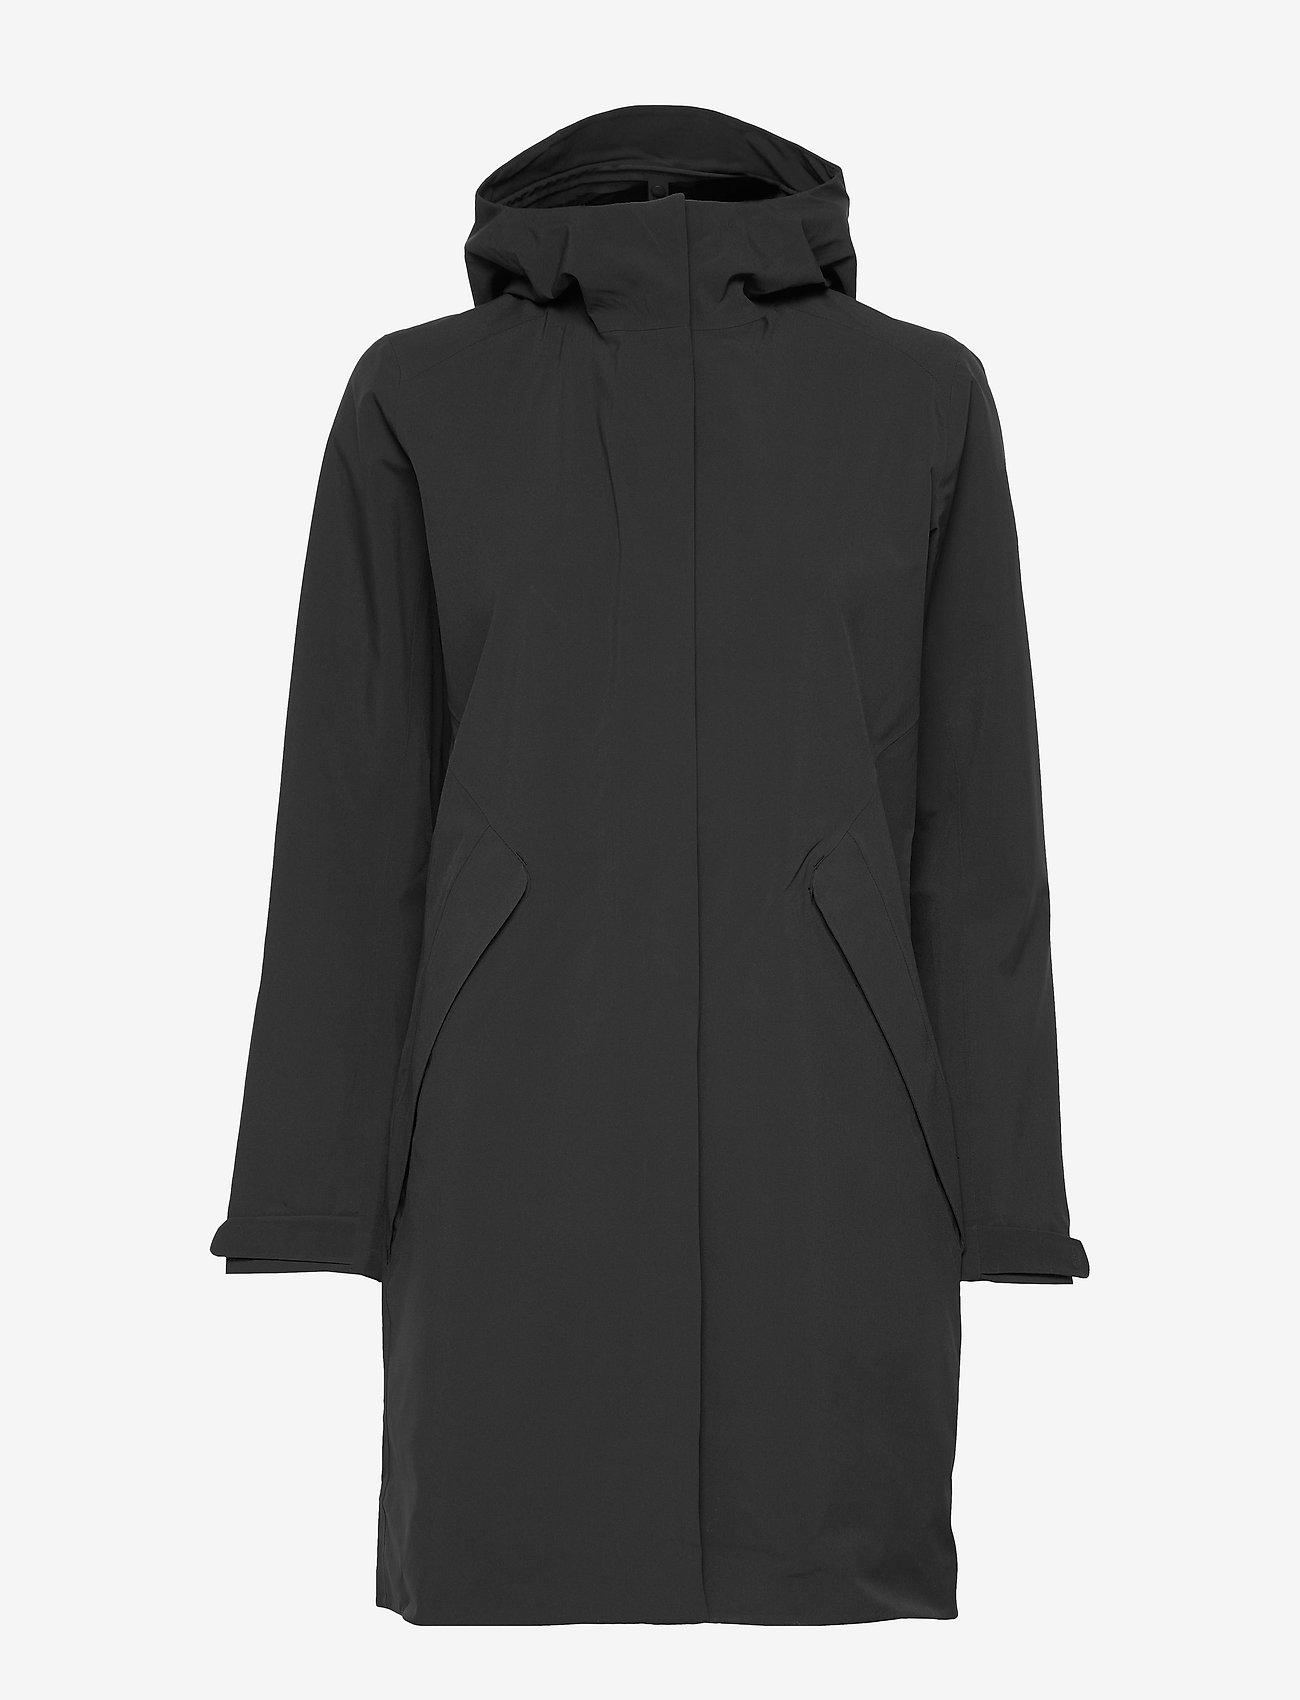 Sail Racing - W LINK COAT - parka coats - phantom grey - 0